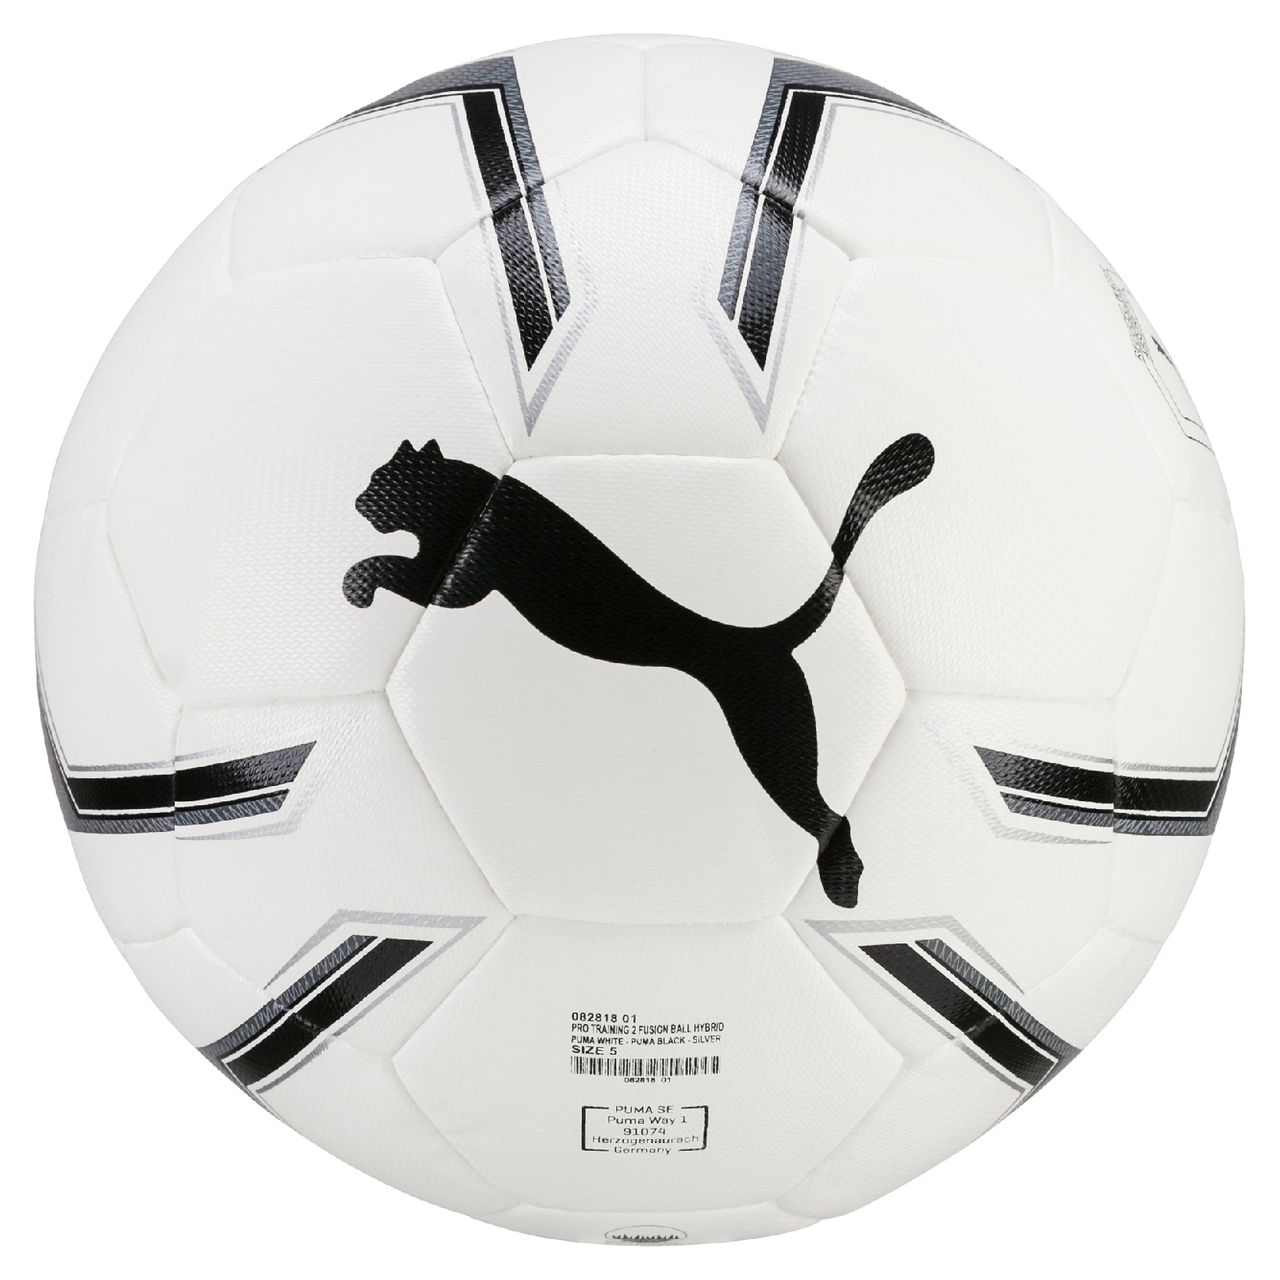 PUMA Trainingsball - Pro Training 2 HYBRID